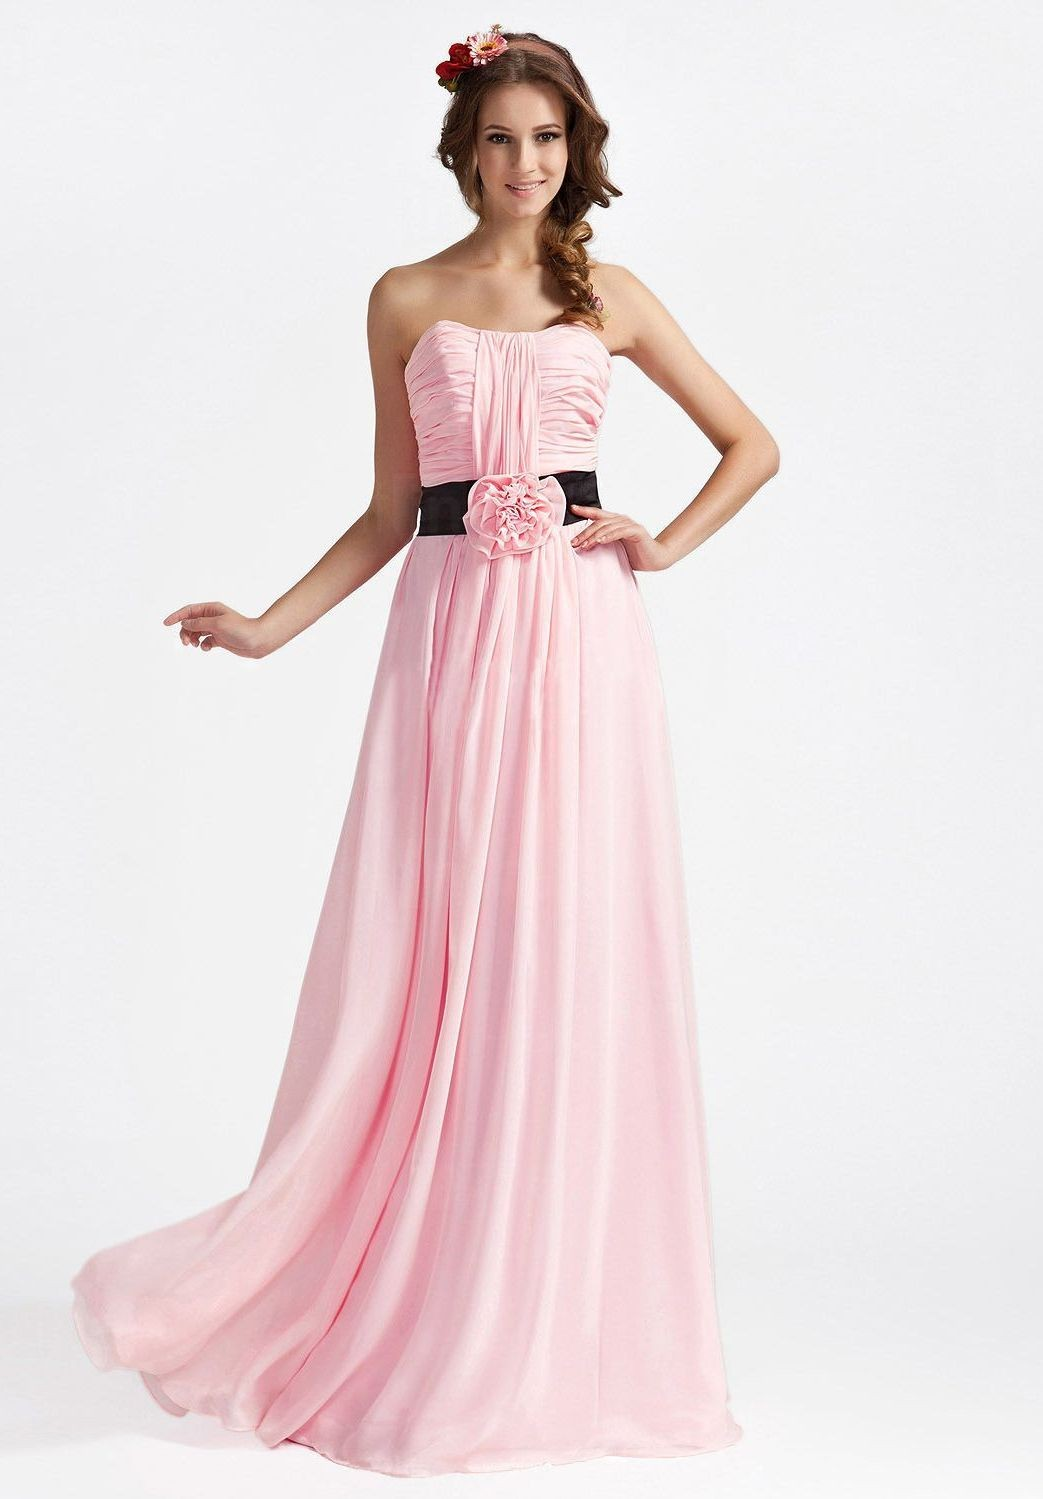 WhiteAzalea Bridesmaid Dresses: Romantic Pink Bridesmaid ...